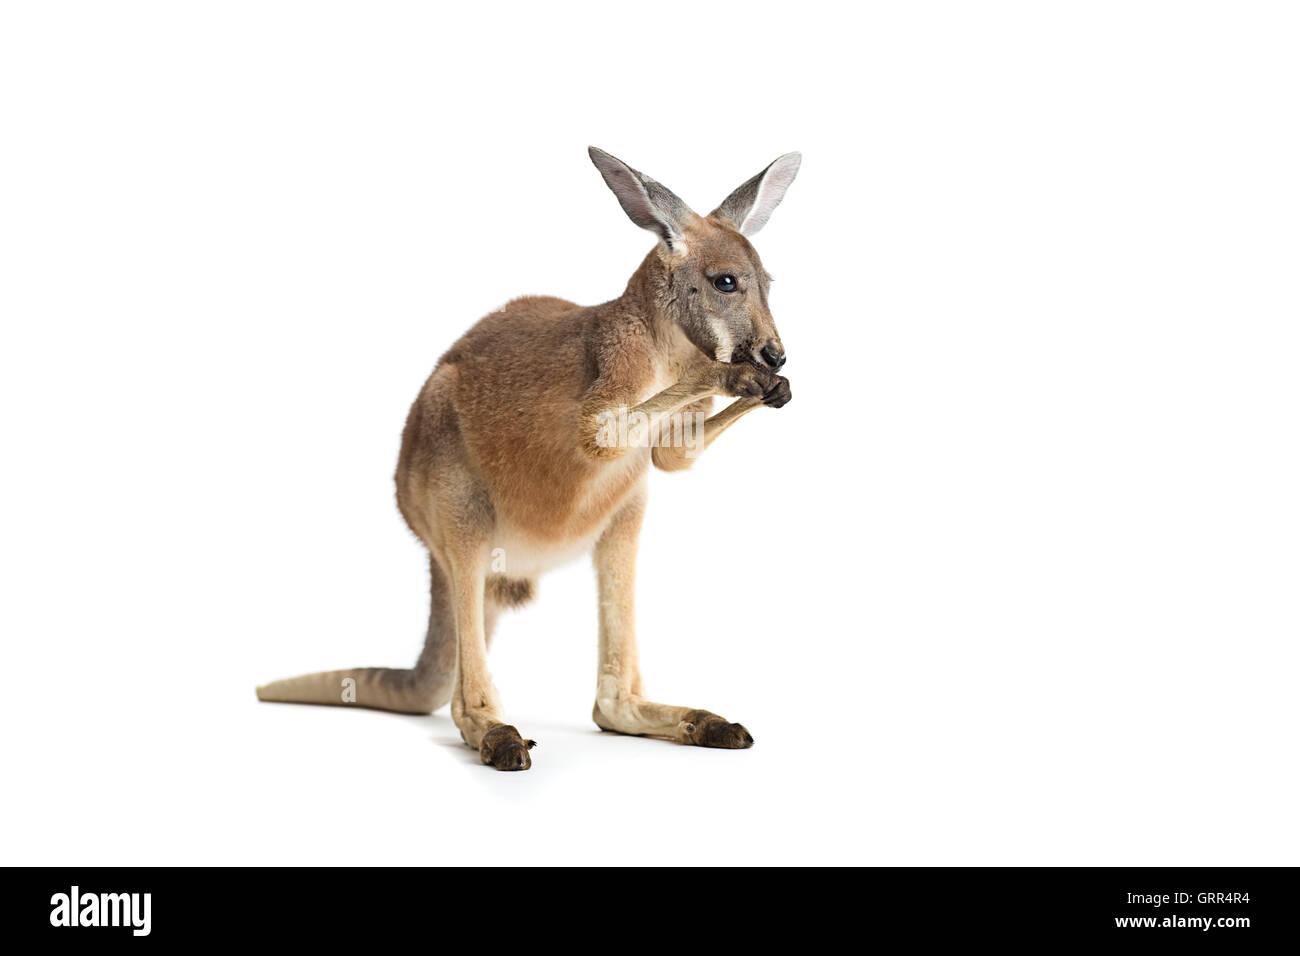 Red kangaroo on white background - Stock Image